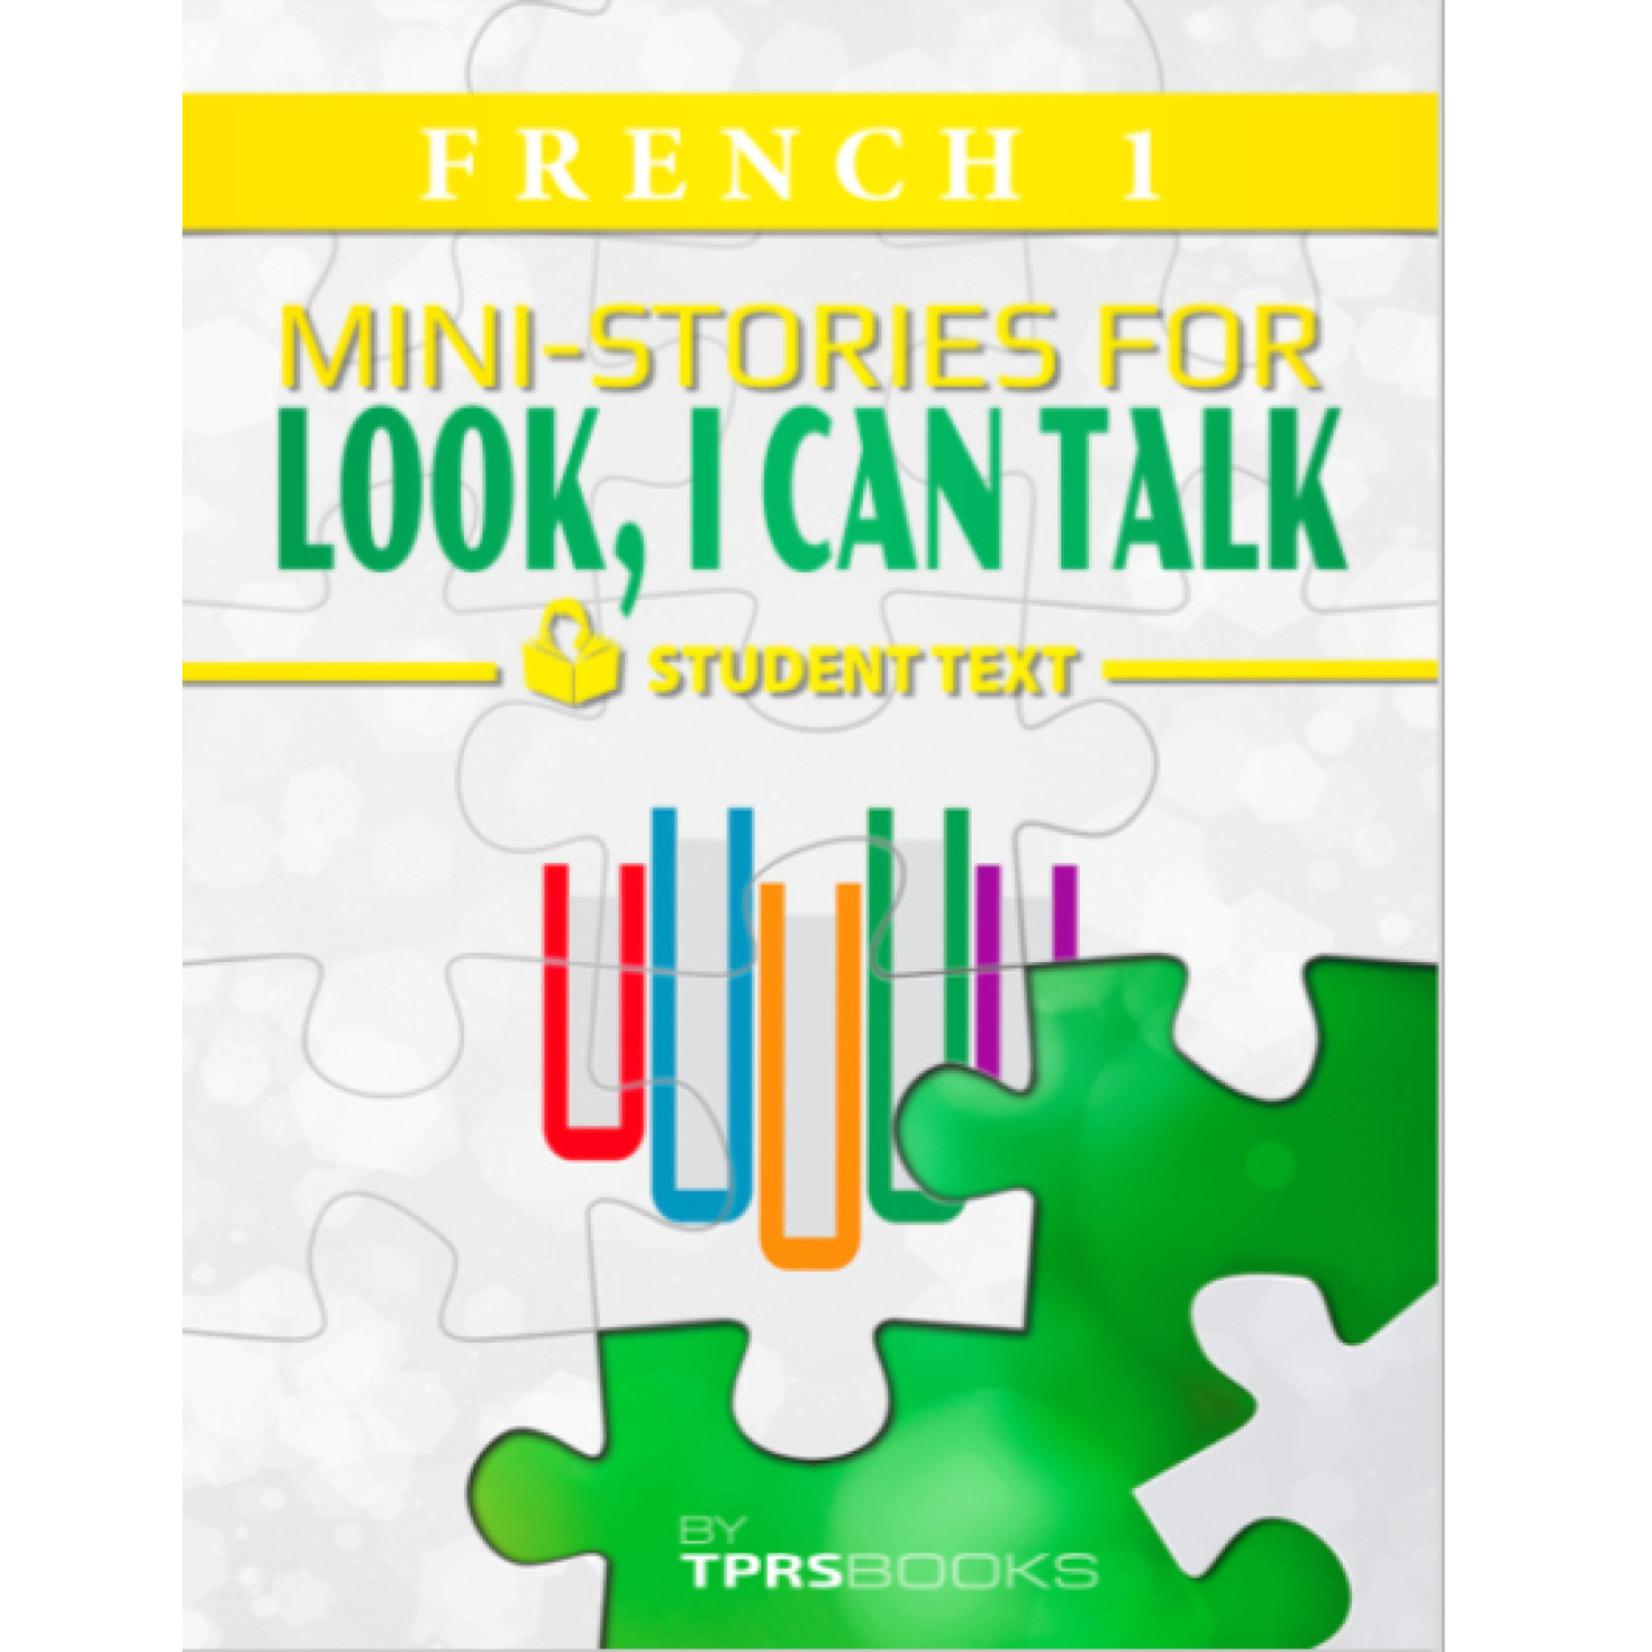 TPRS Books Frans 1 - Look, I can talk! Werkboek